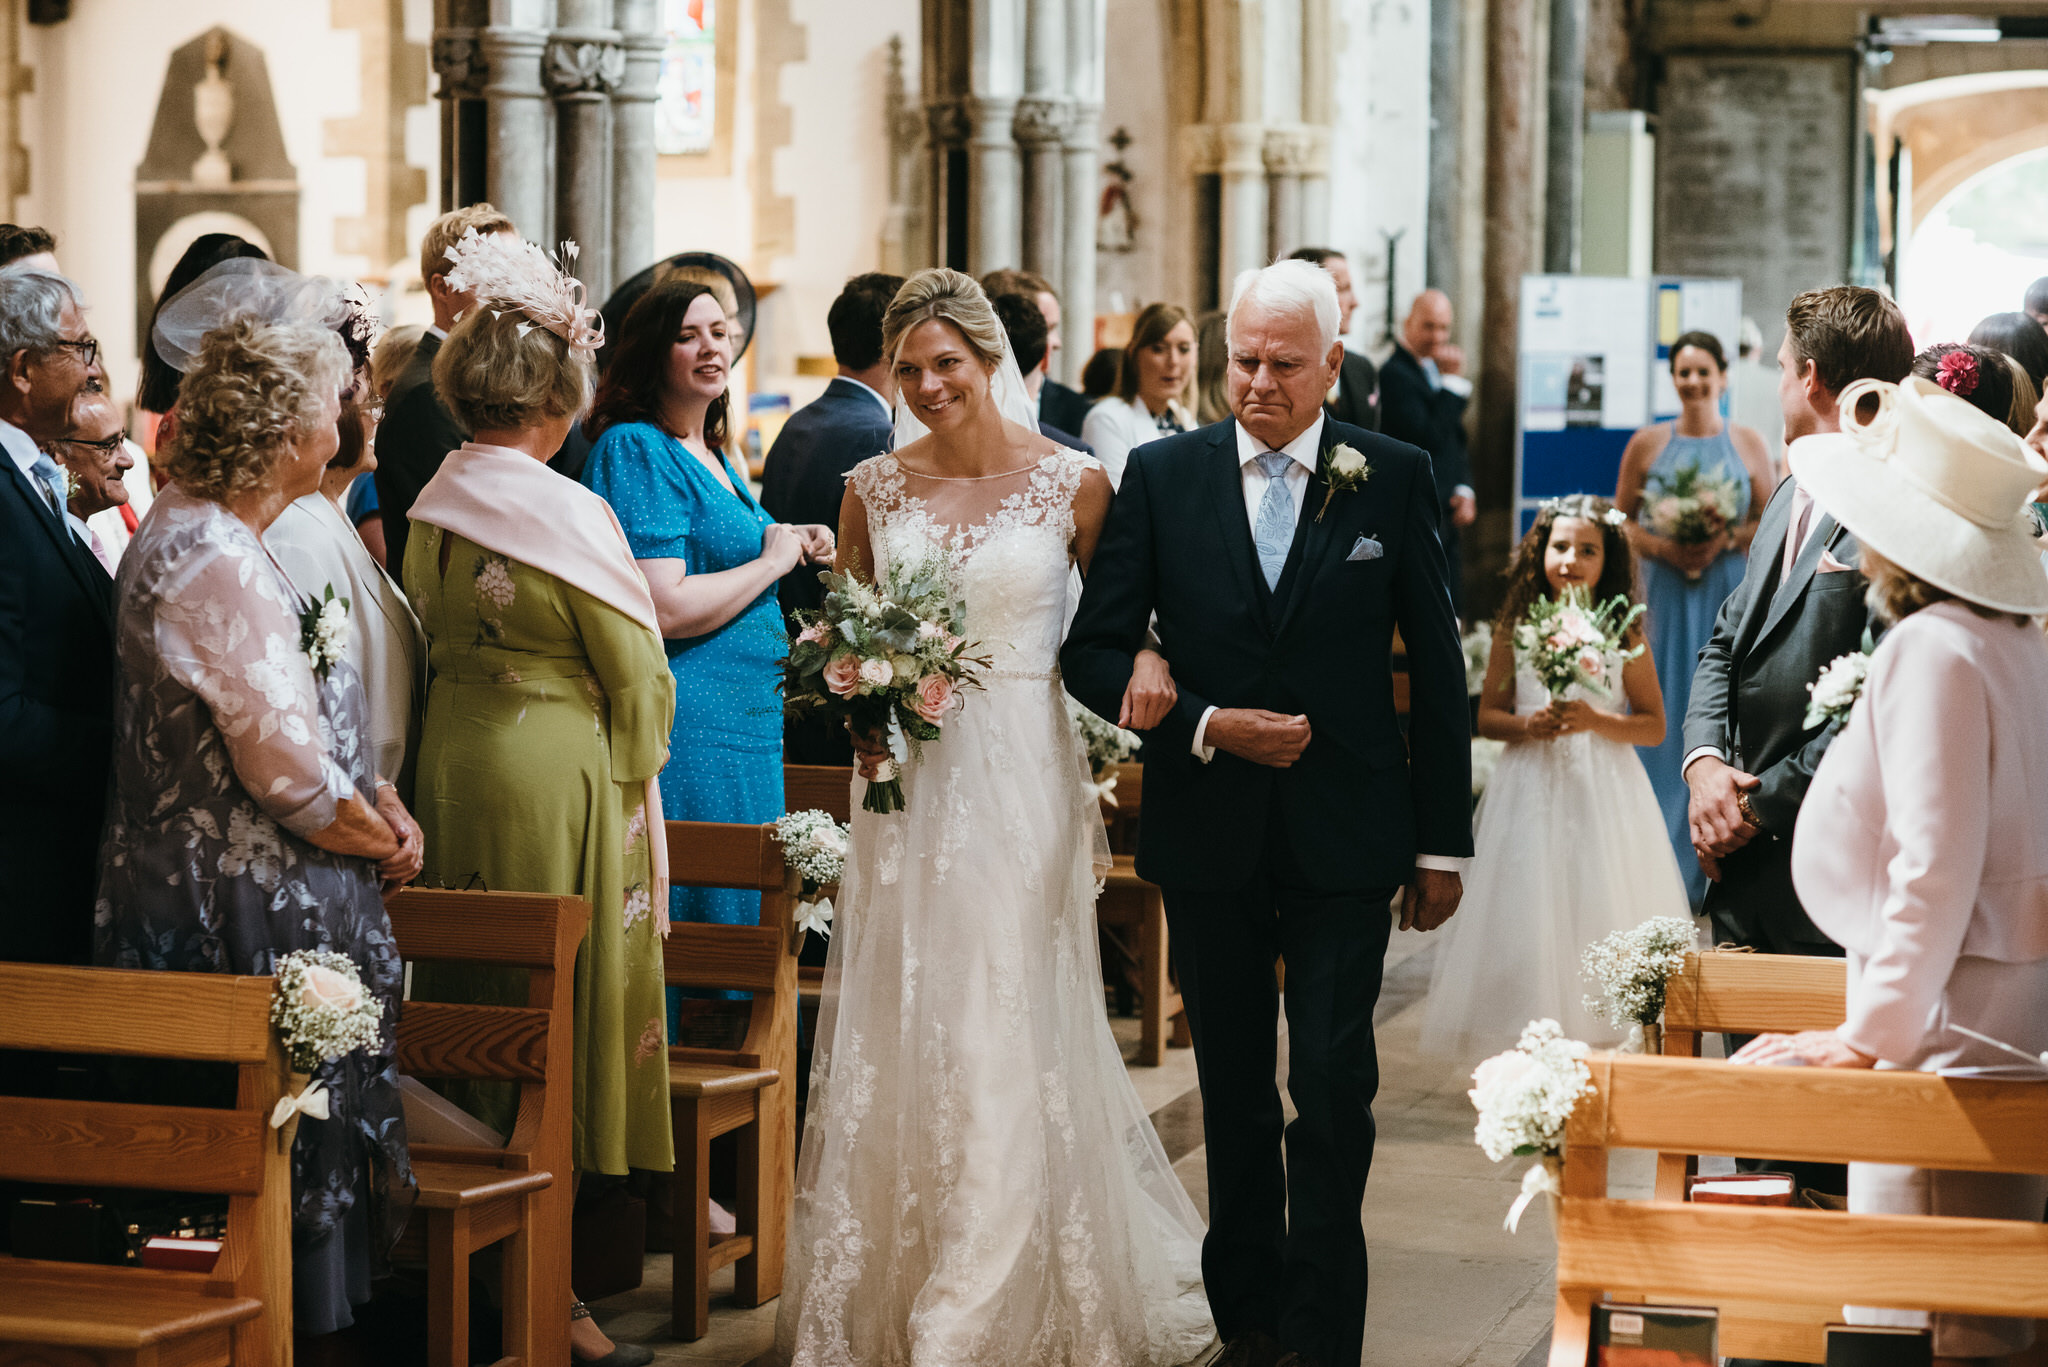 Sidmouth church wedding ceremony